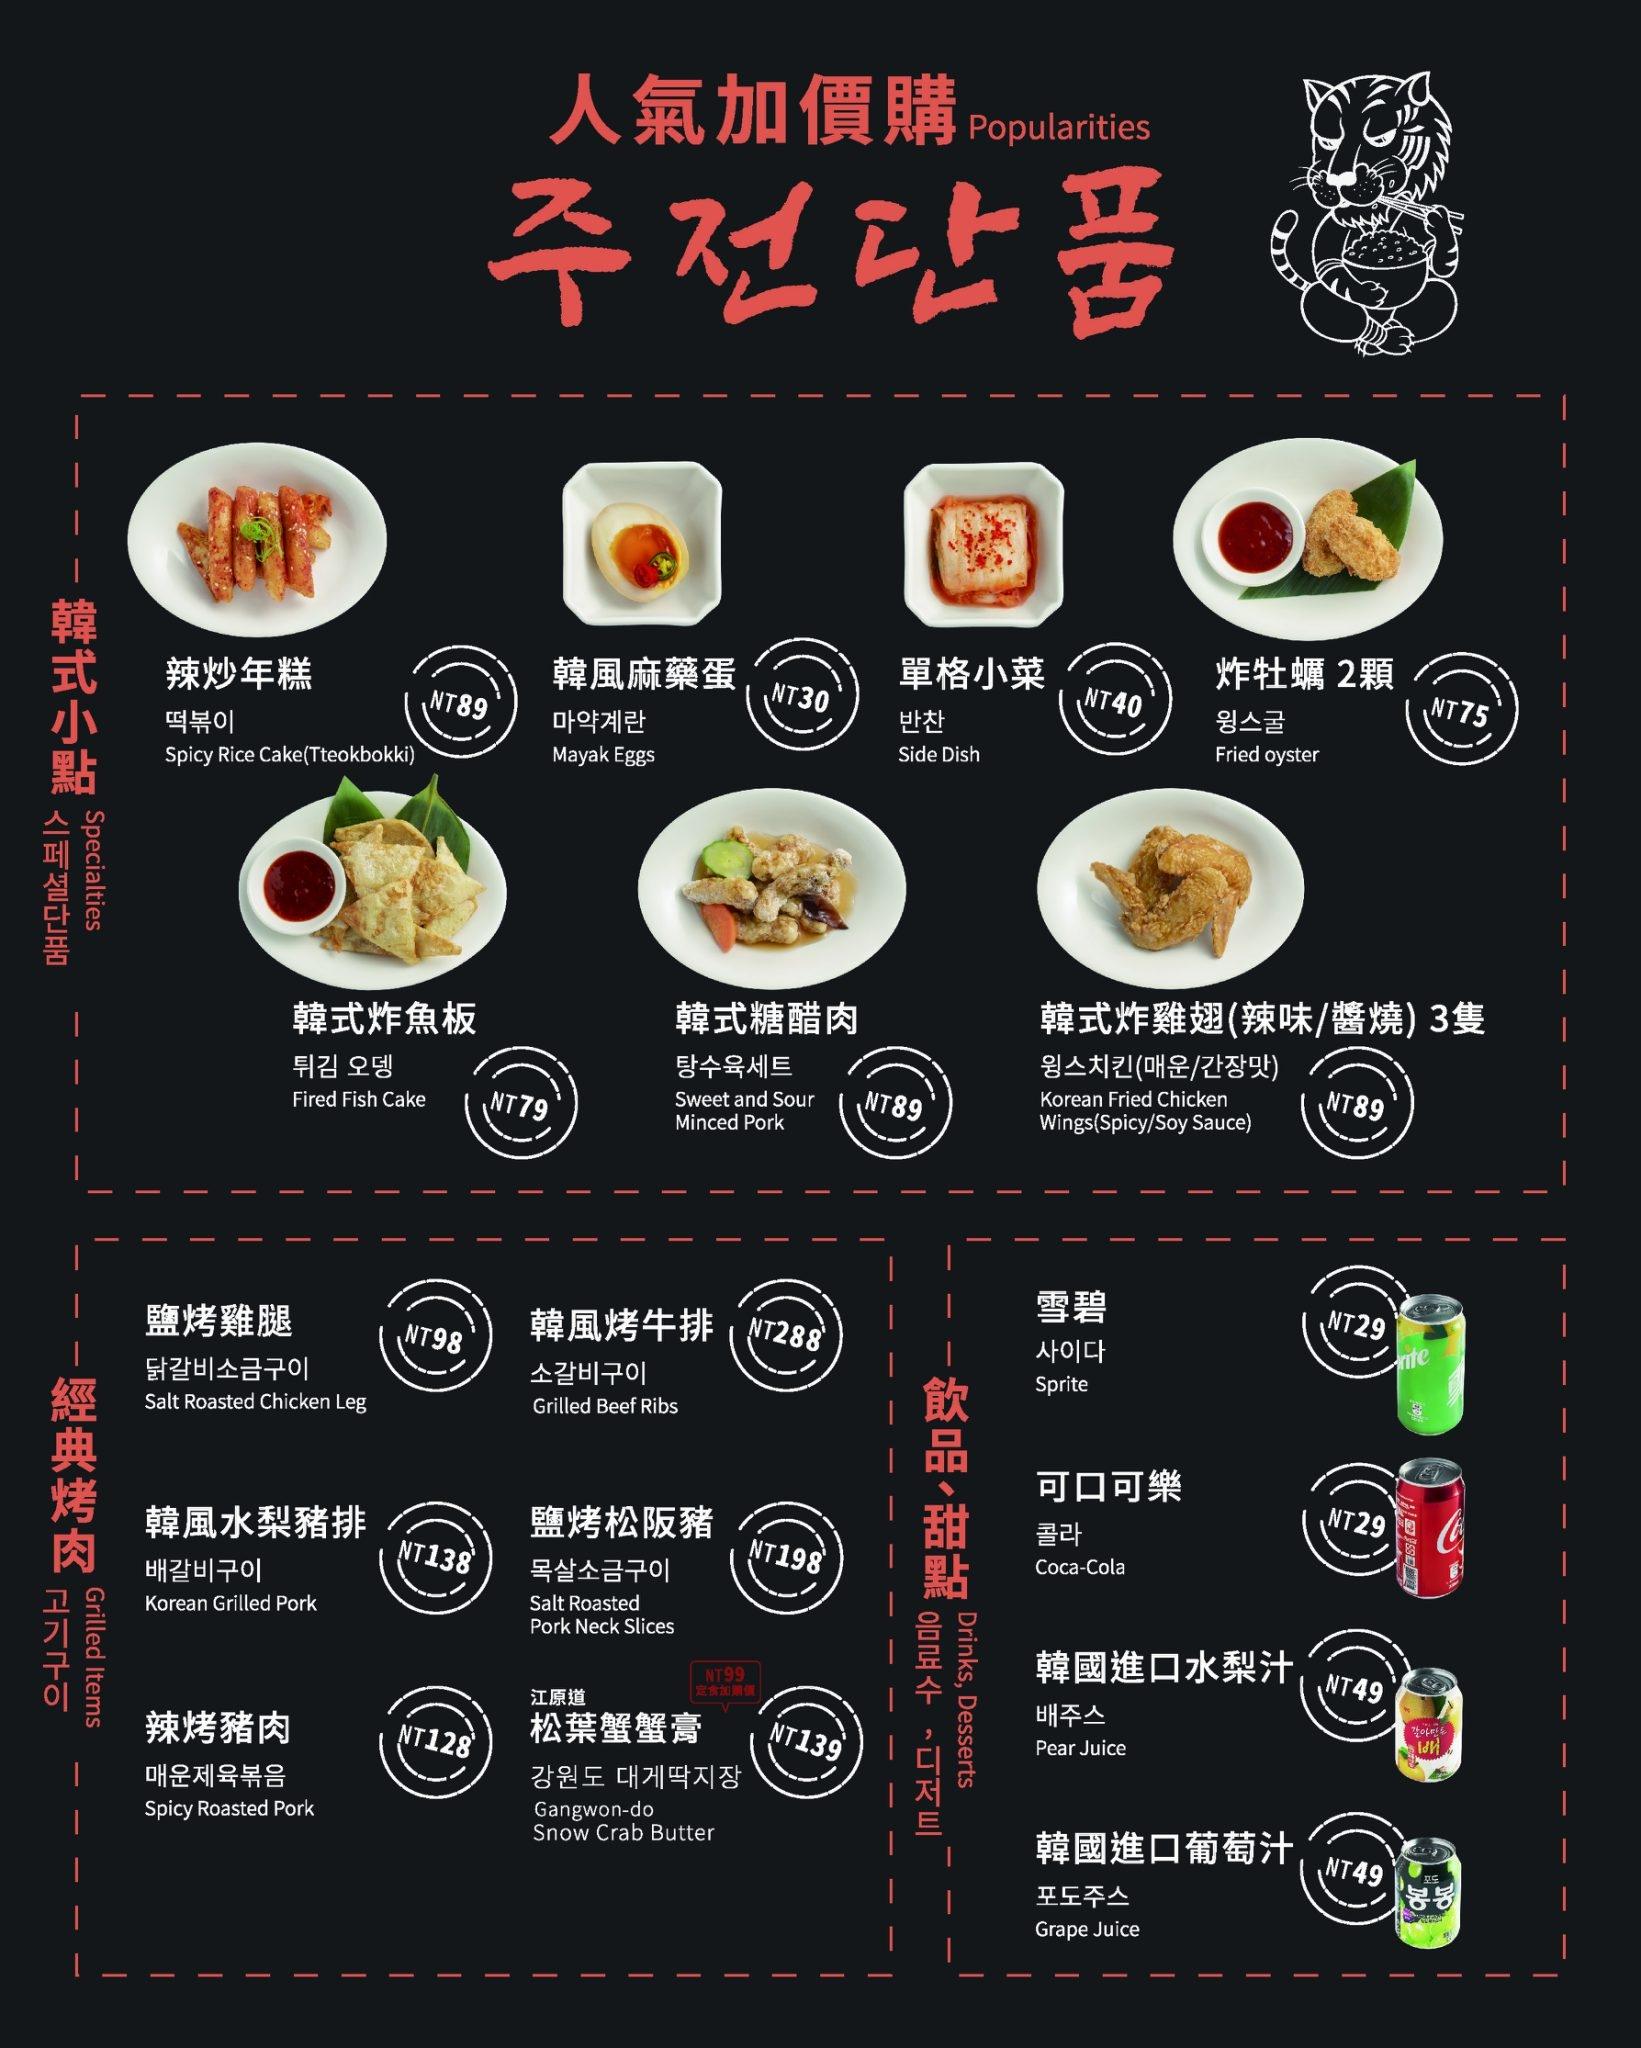 Menu | 偷飯賊2020菜單。台北好吃韓國料理 台北韓式料理 信義區美食 台北美食 雪濃湯 @蹦啾♥謝蘿莉 La vie heureuse